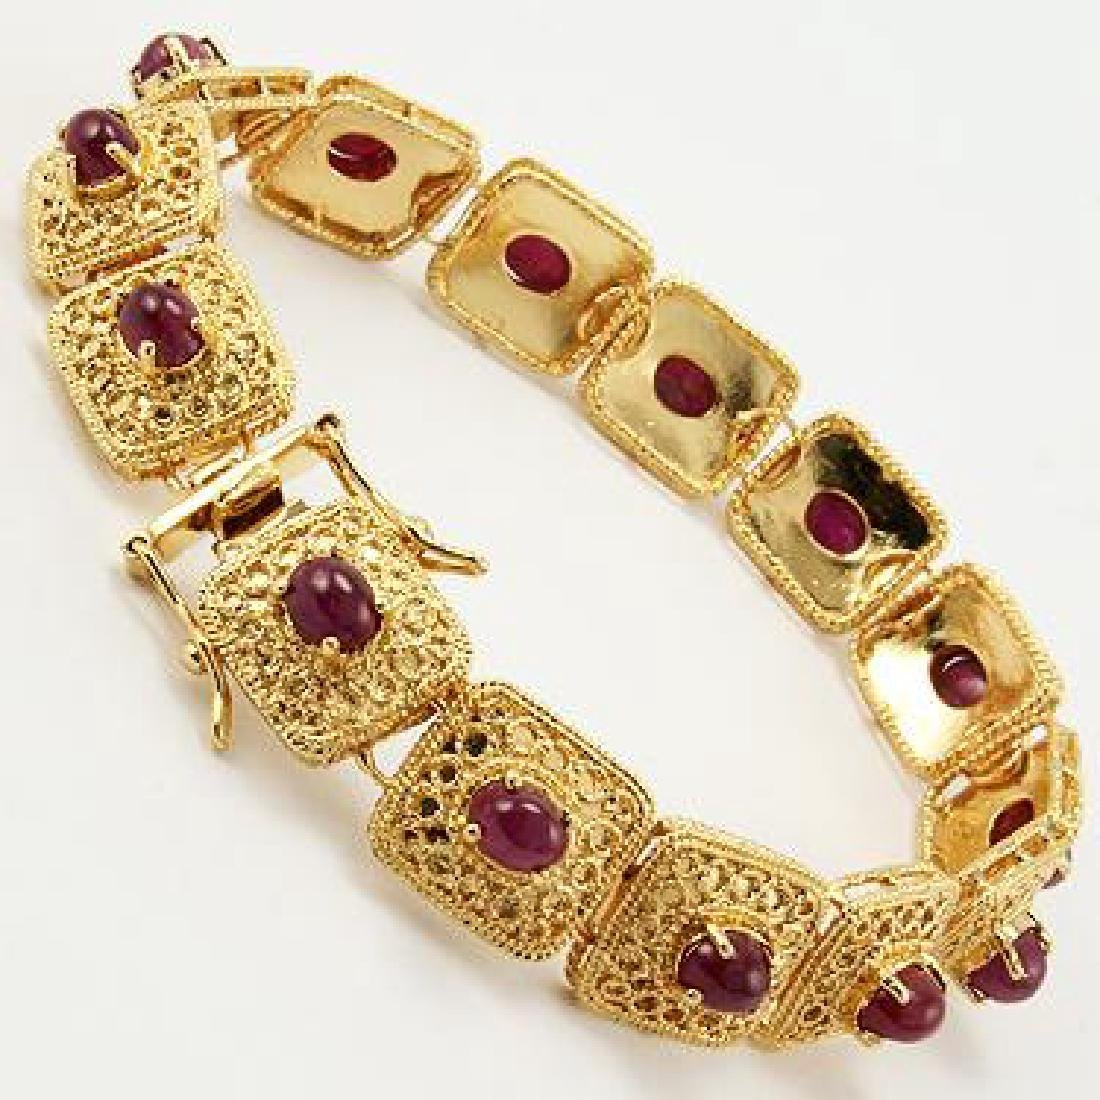 7 CT Cabochon Ruby Gold Bracelet - 3